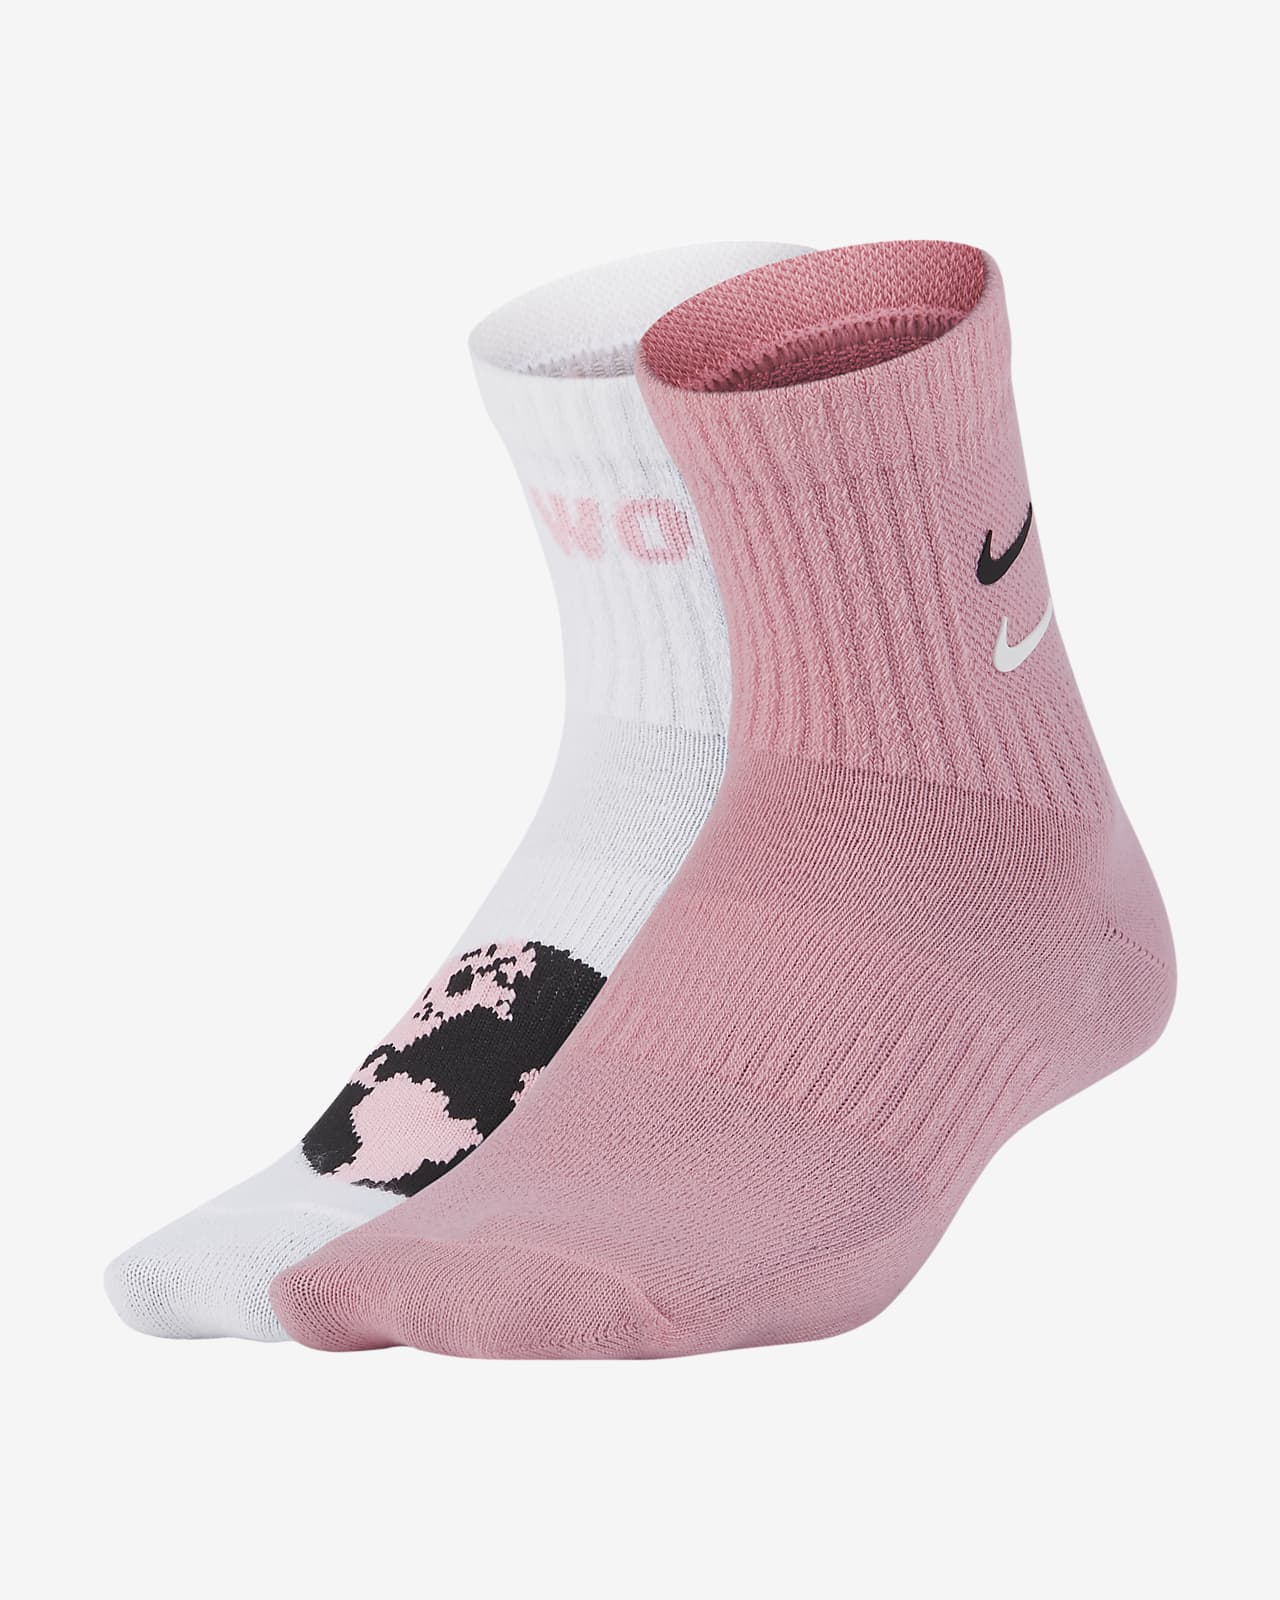 Nike Swoosh Lightweight Ankle 儿童运动童袜(2 双)